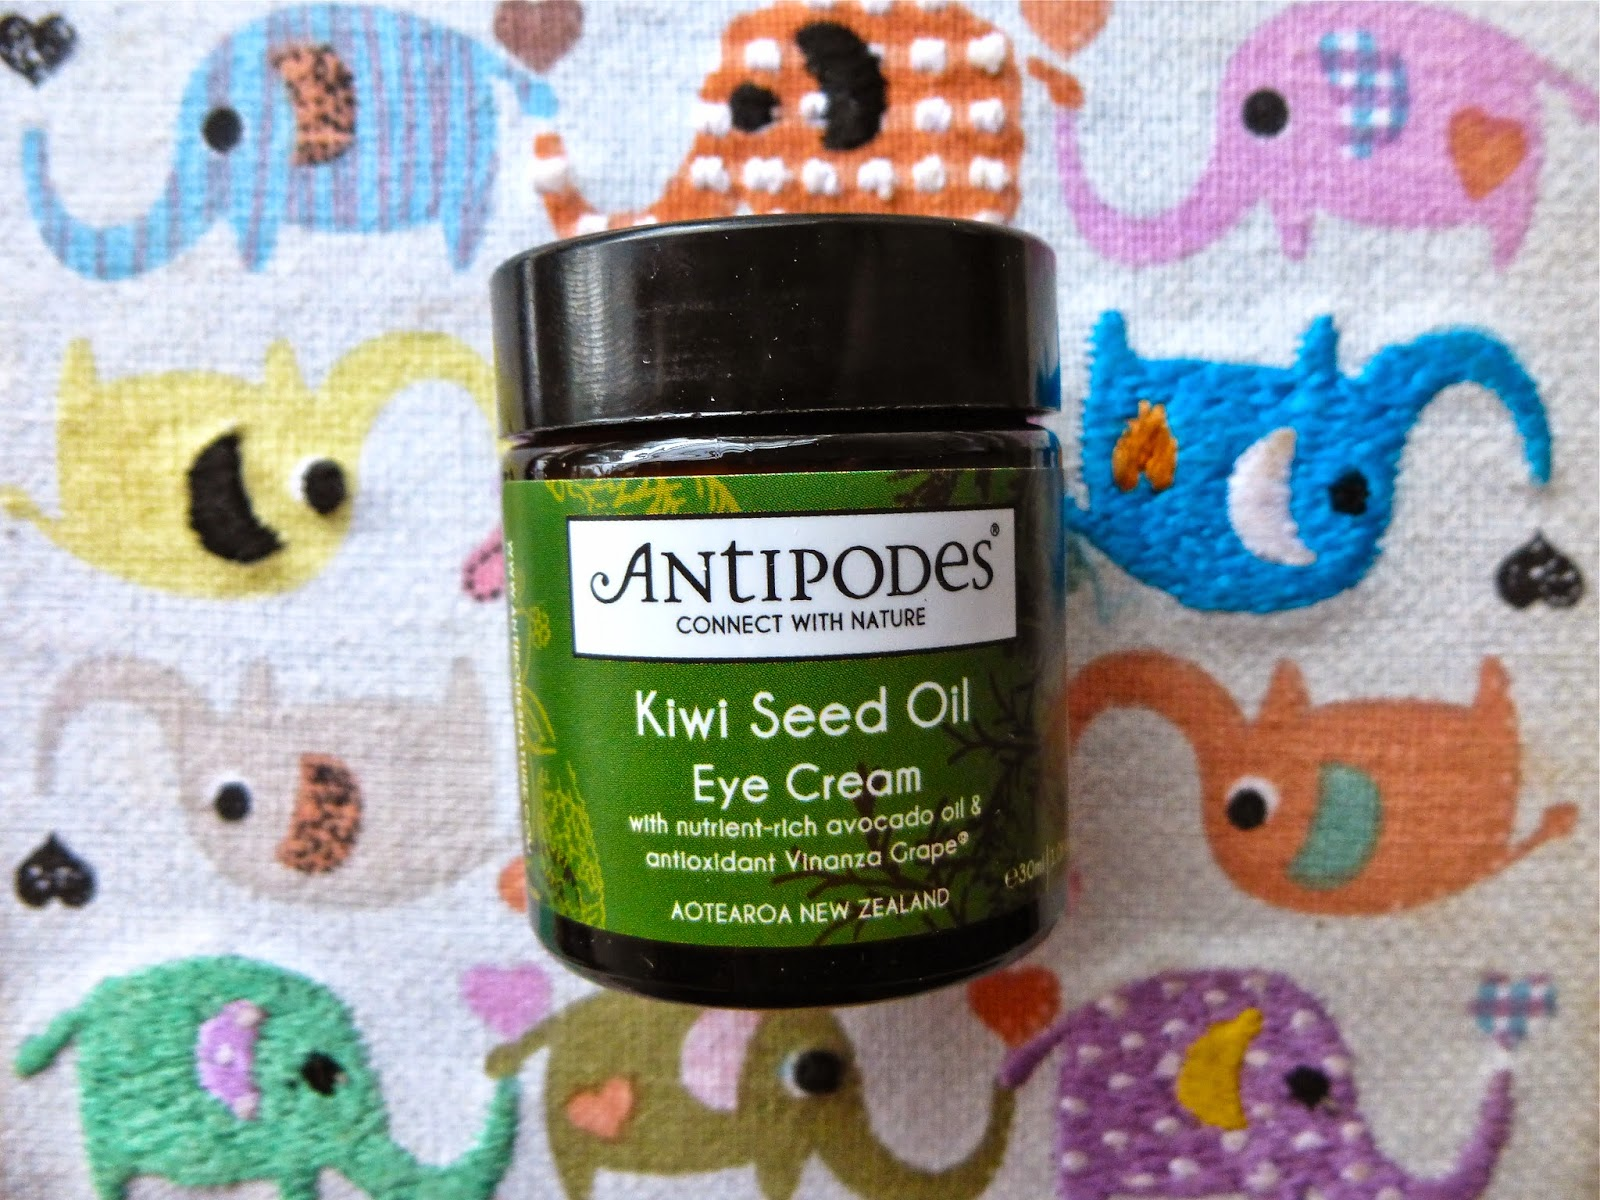 What Louise is Loving: Antipodes Kiwi Seed Oil Eye Cream